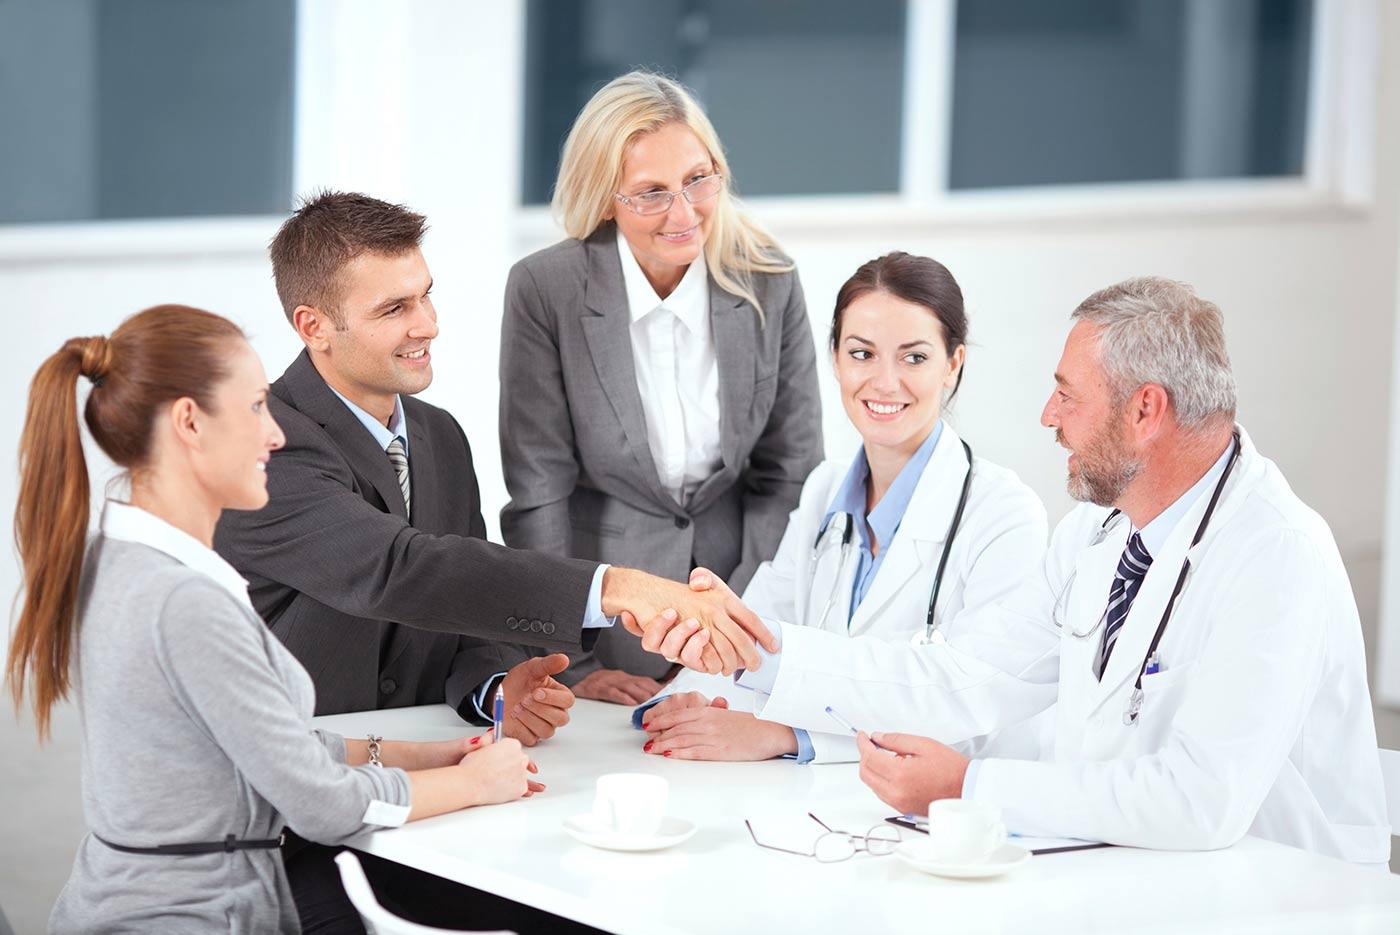 heathcare_meeting